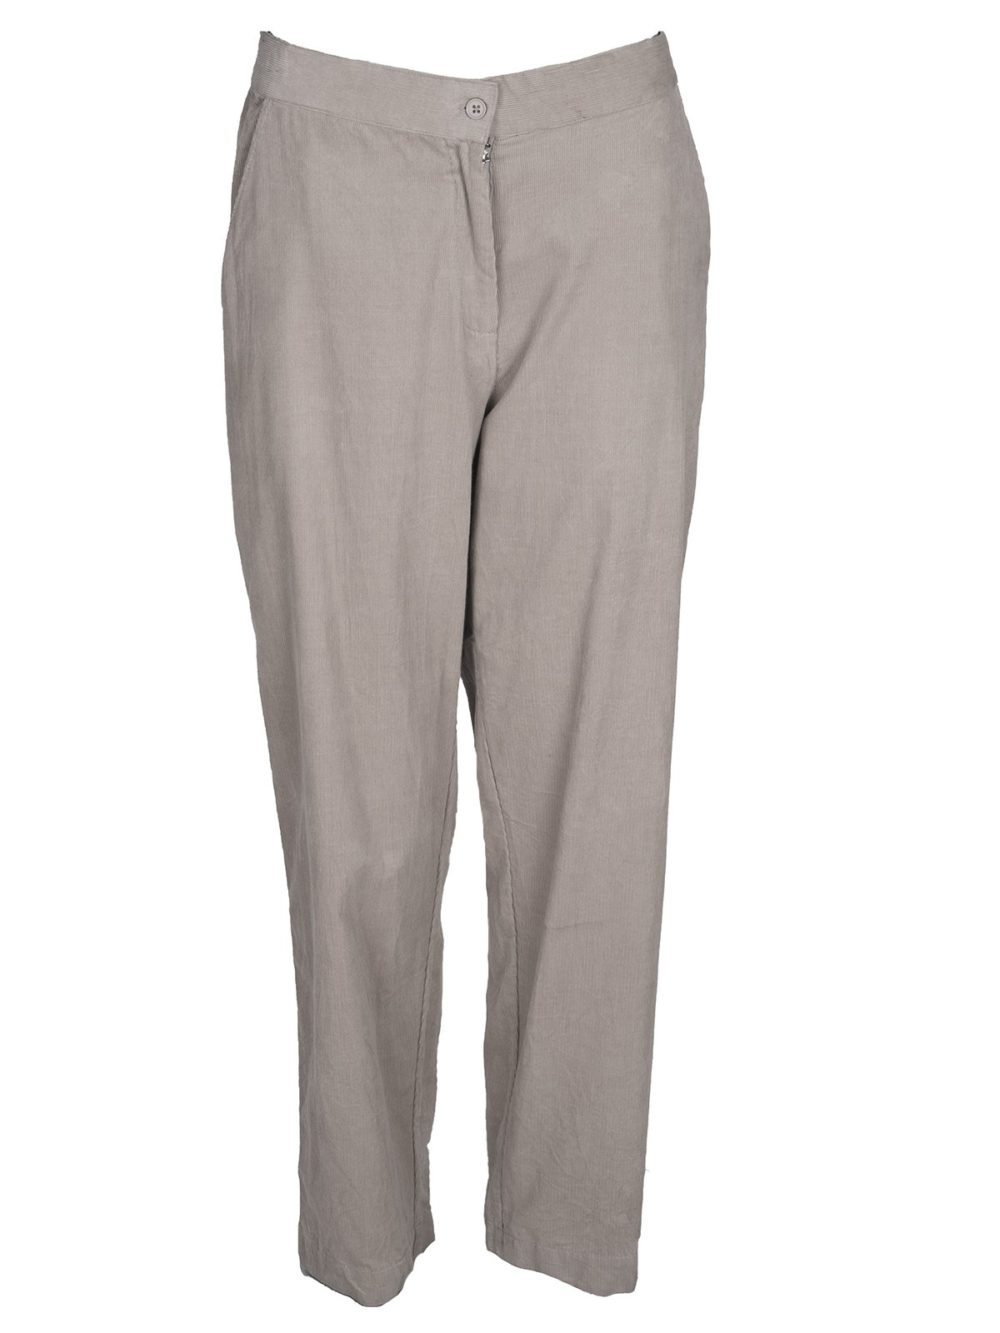 Cresta Trousers